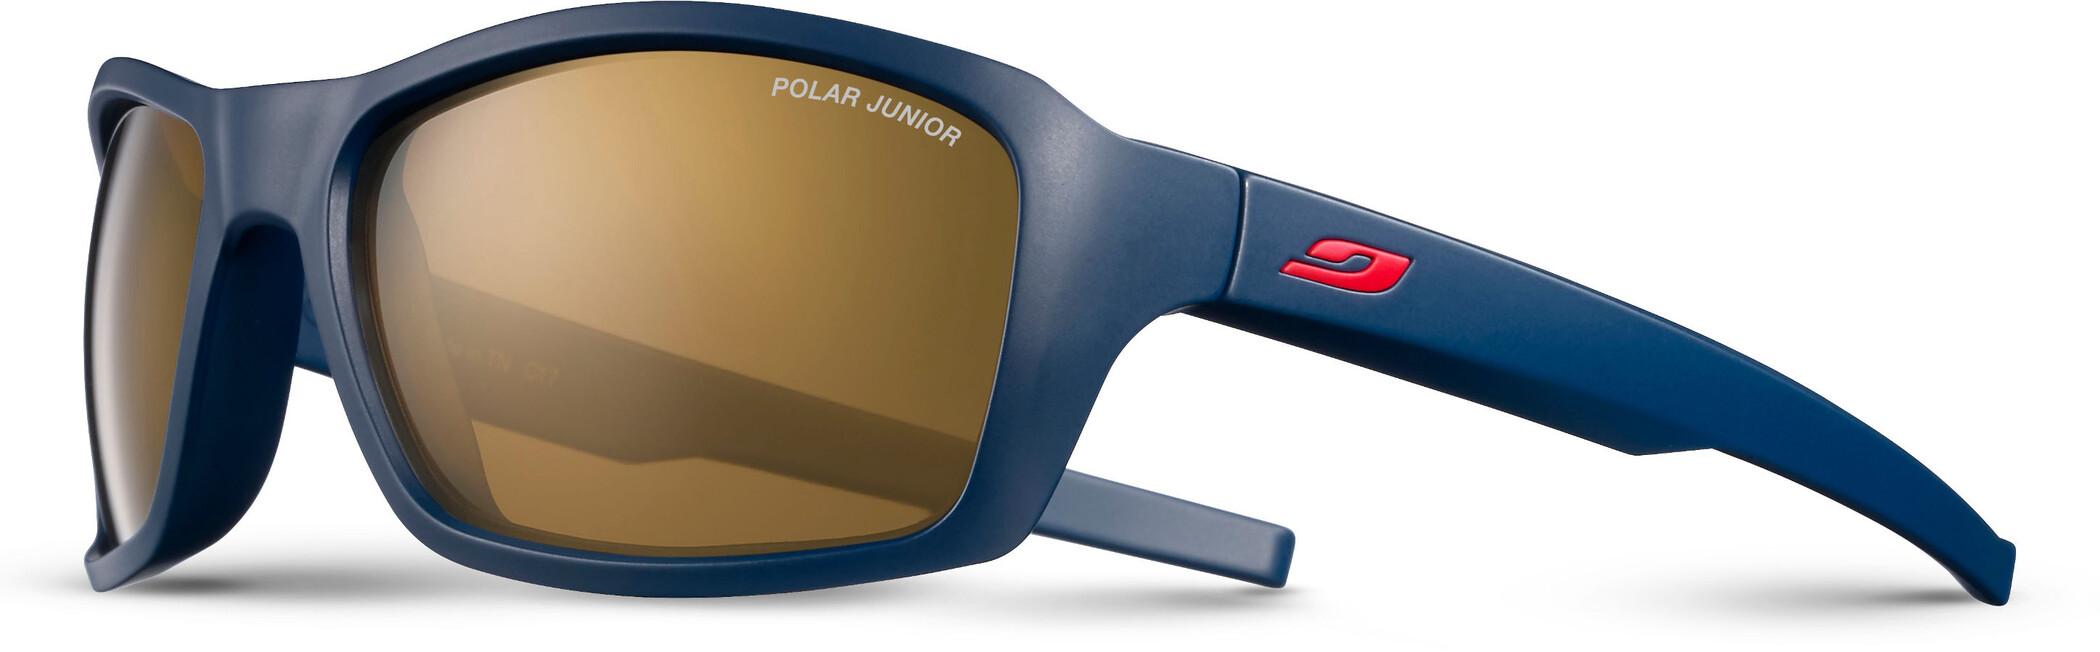 Julbo Extend 2.0 Polar Sunglasses 8-12Y Kids, matt blue-brown (2020) | Glasses